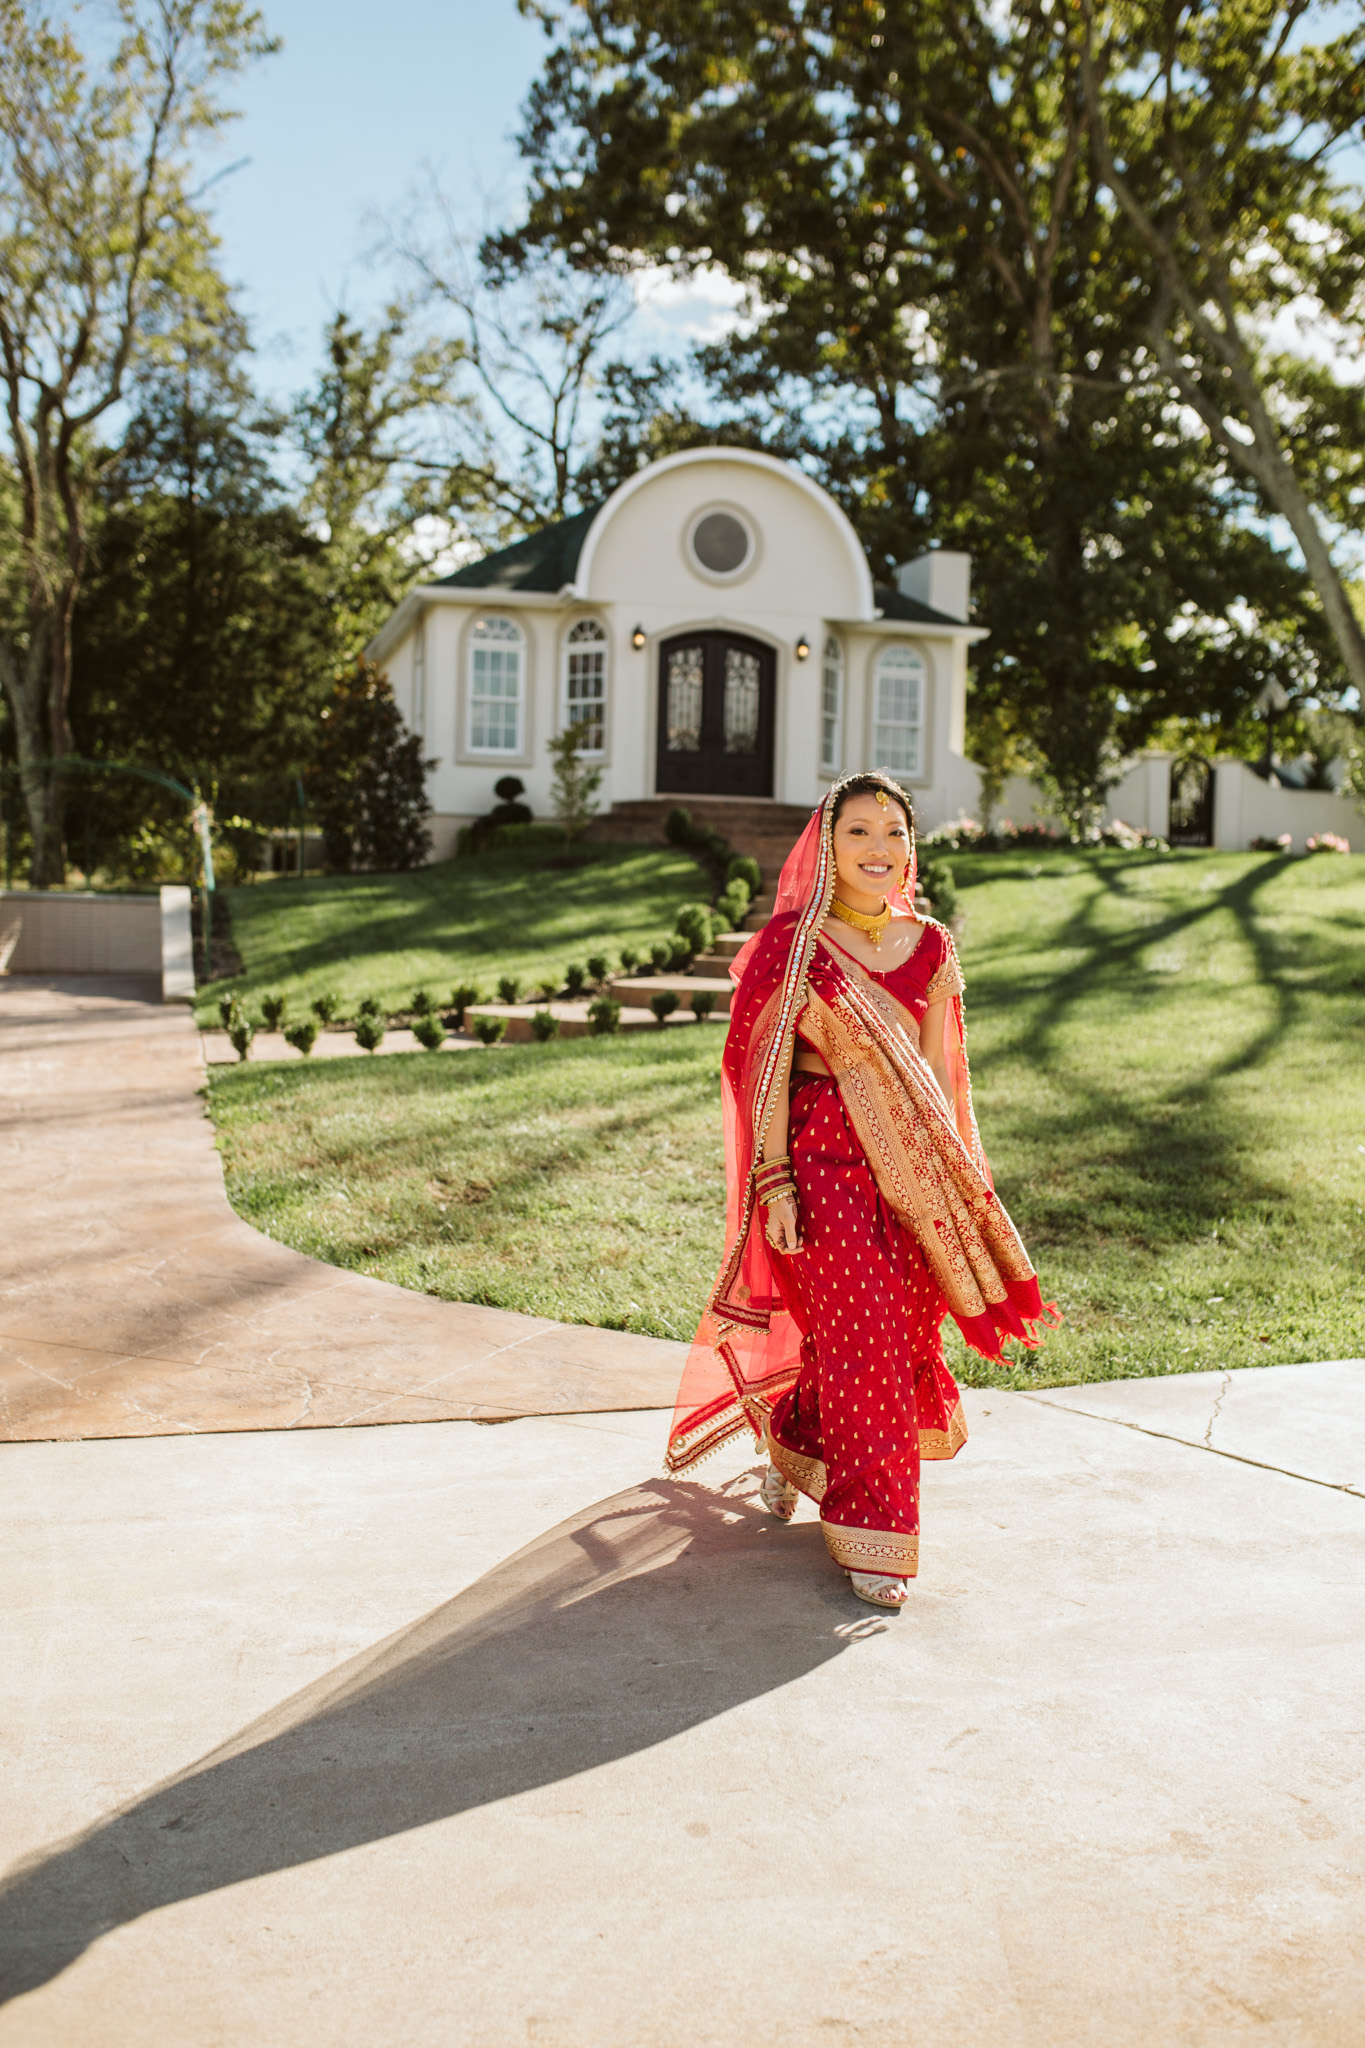 rebeccaburtphotography.hindiwedding.moraisvineyards.virginiawedding-118.JPG